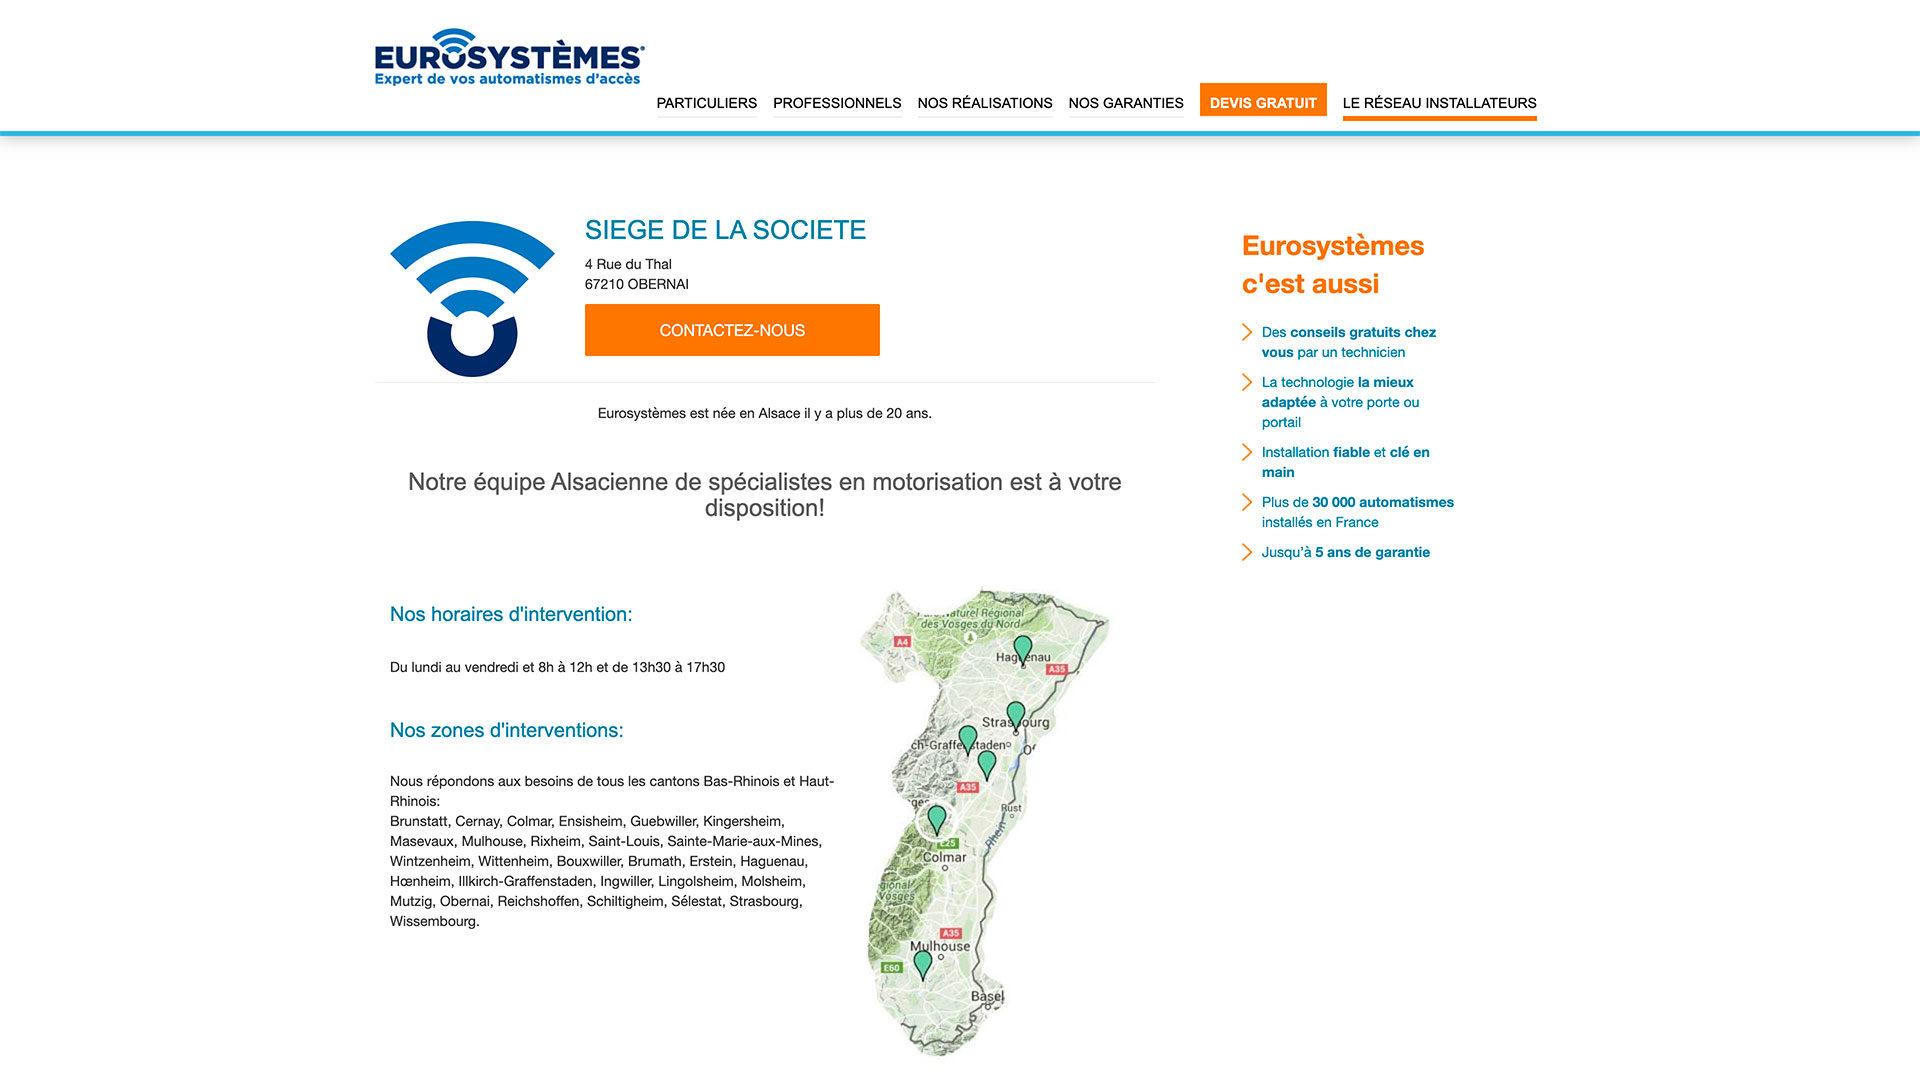 eurosystemes.fr